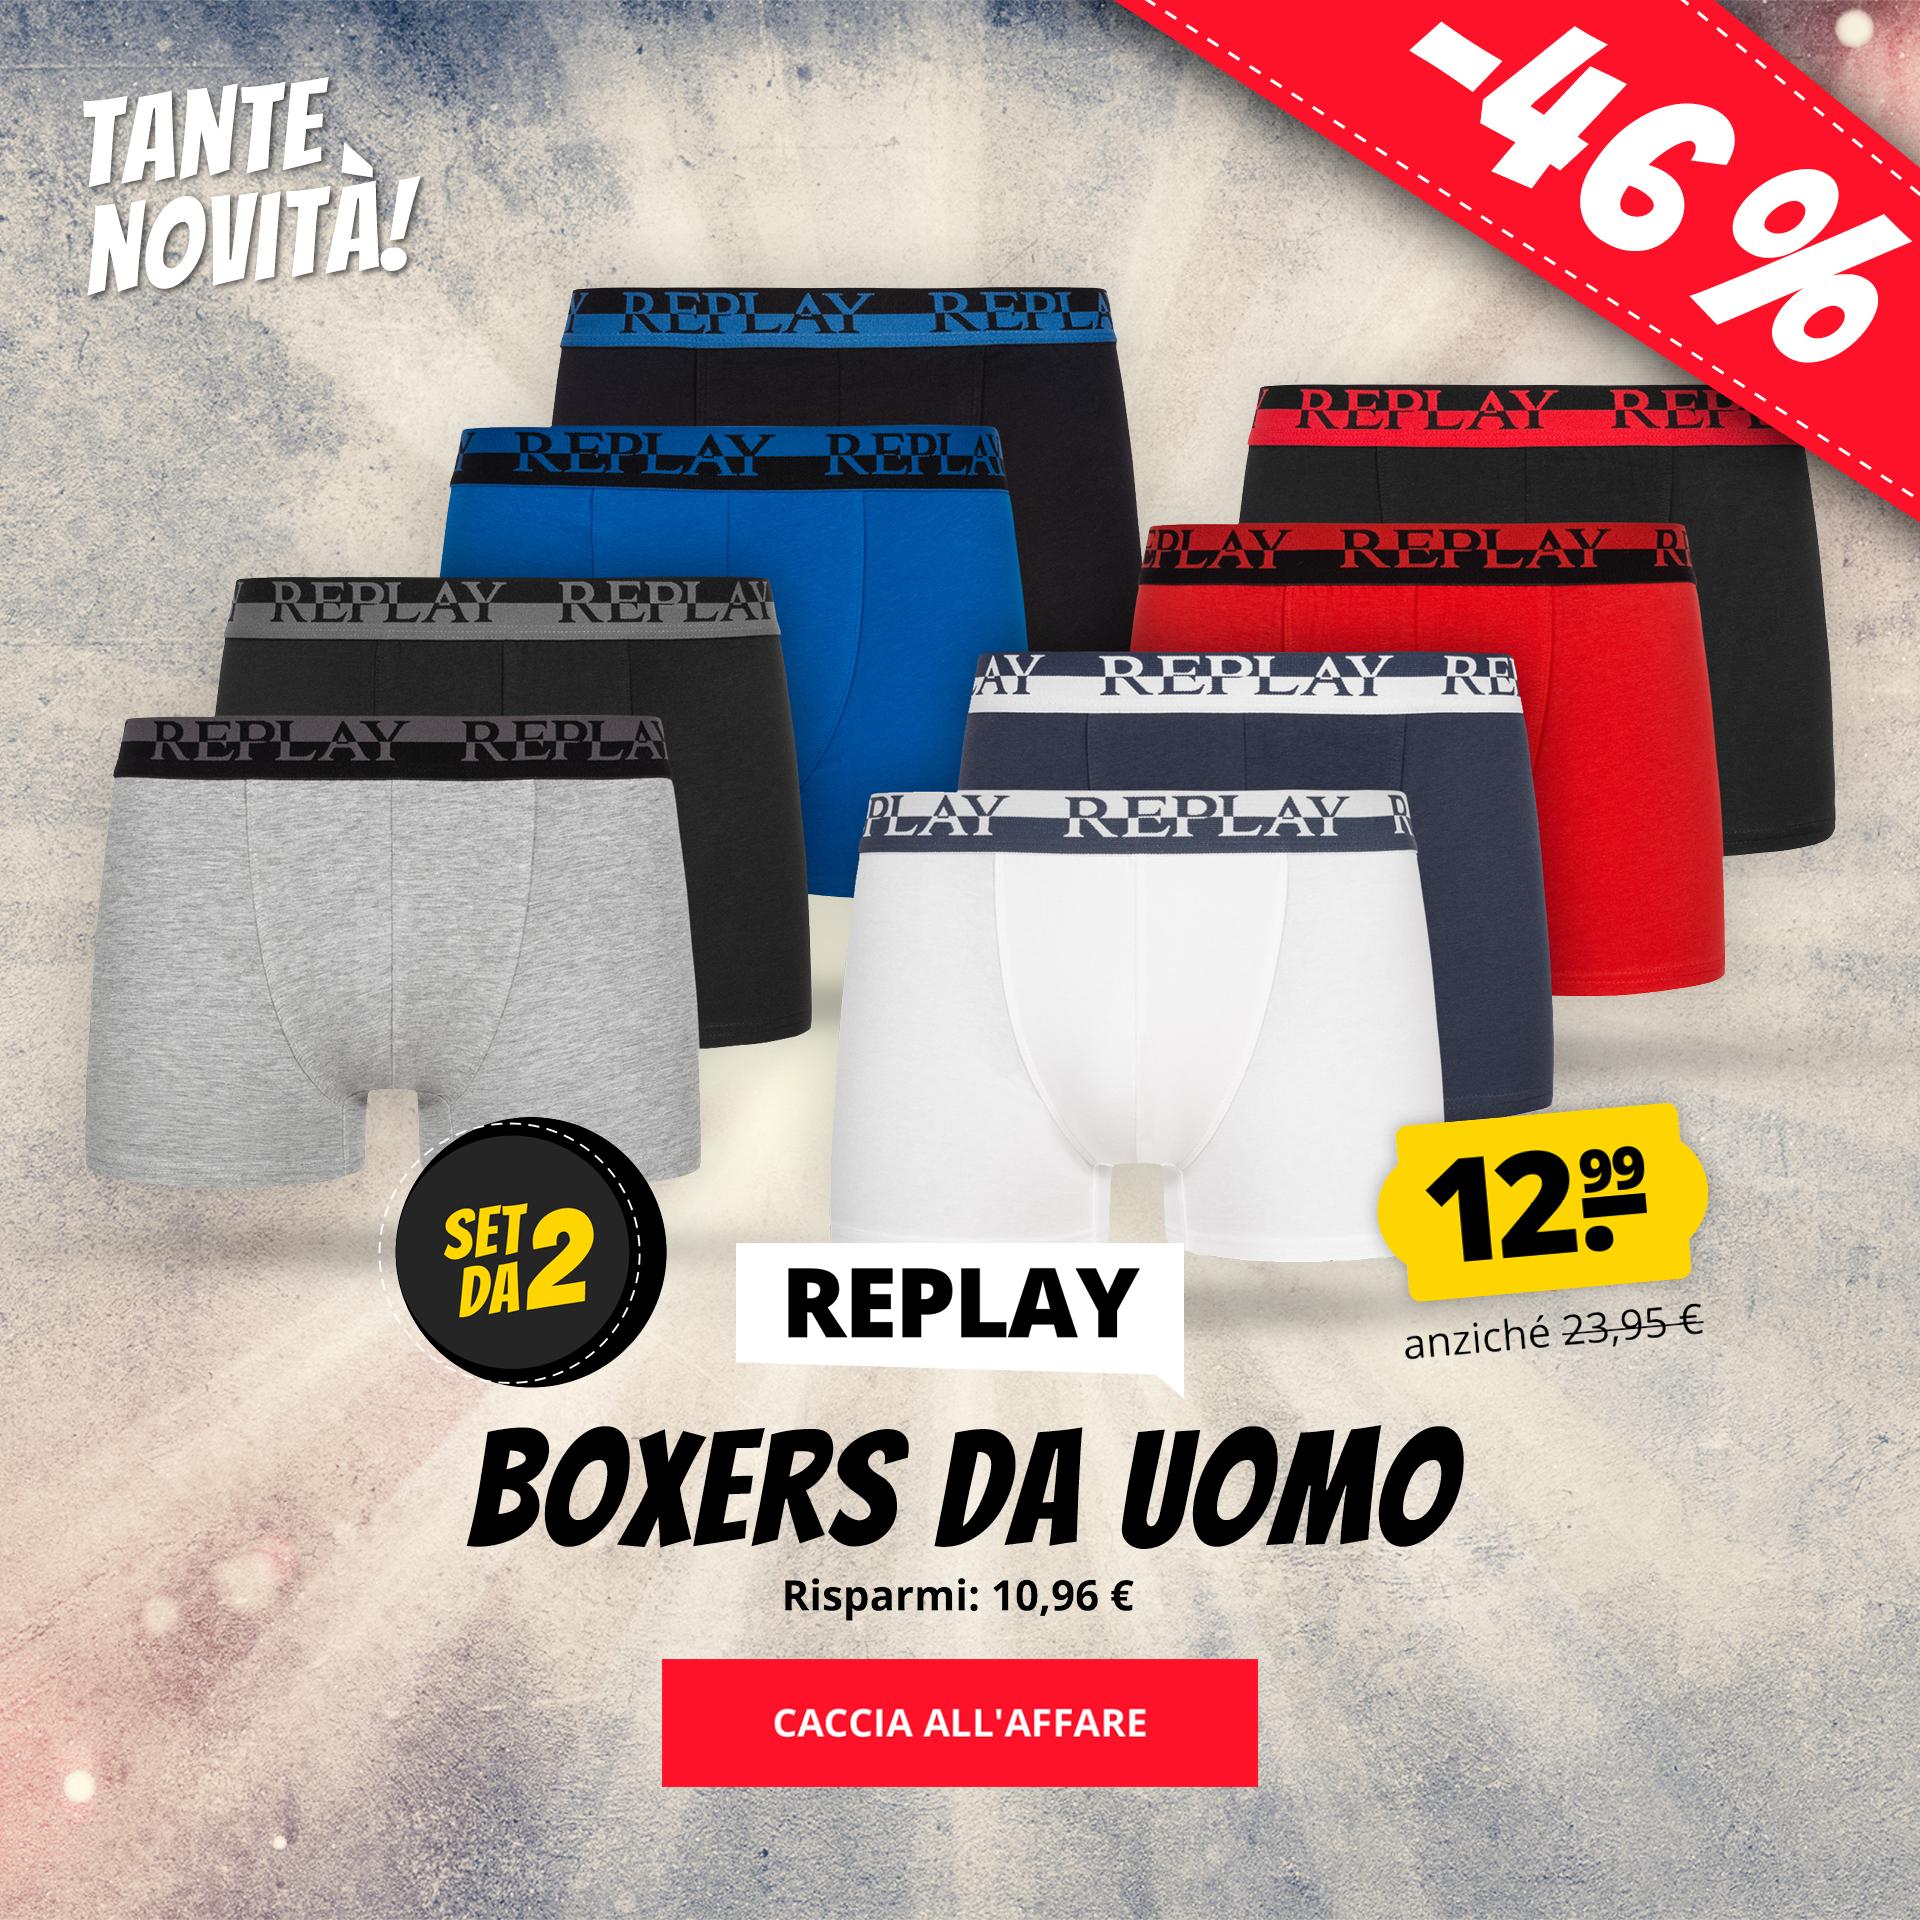 REPLAY Boxers da uomo Set da 2  12,99 €